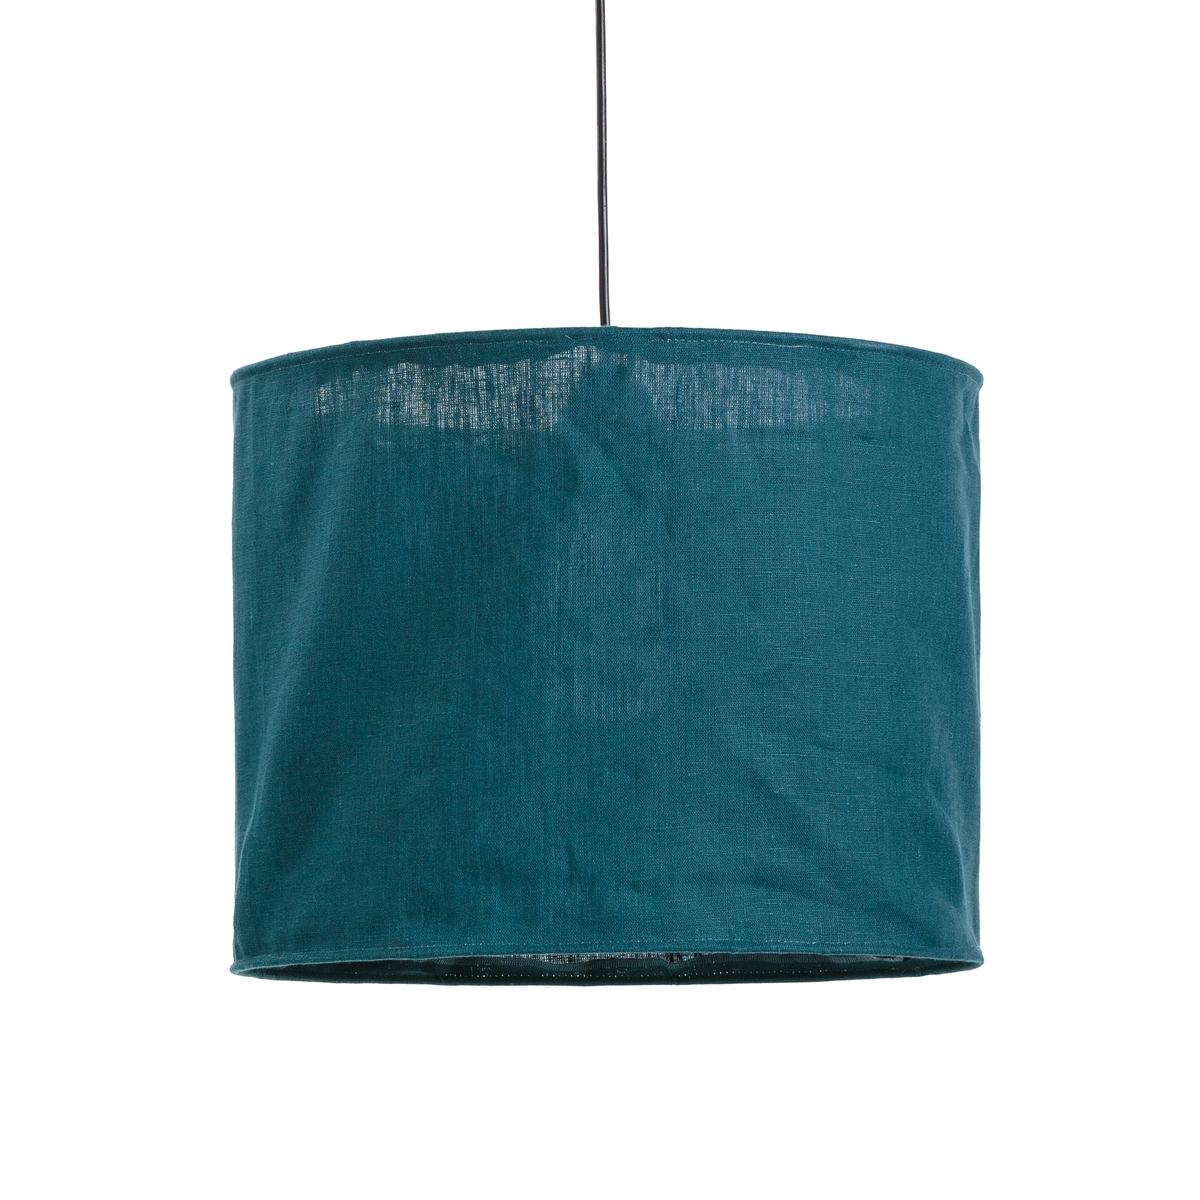 Фото - Абажур LaRedoute Из жатого льна Thade единый размер зеленый сумка шоппер laredoute из льна с блесками единый размер синий